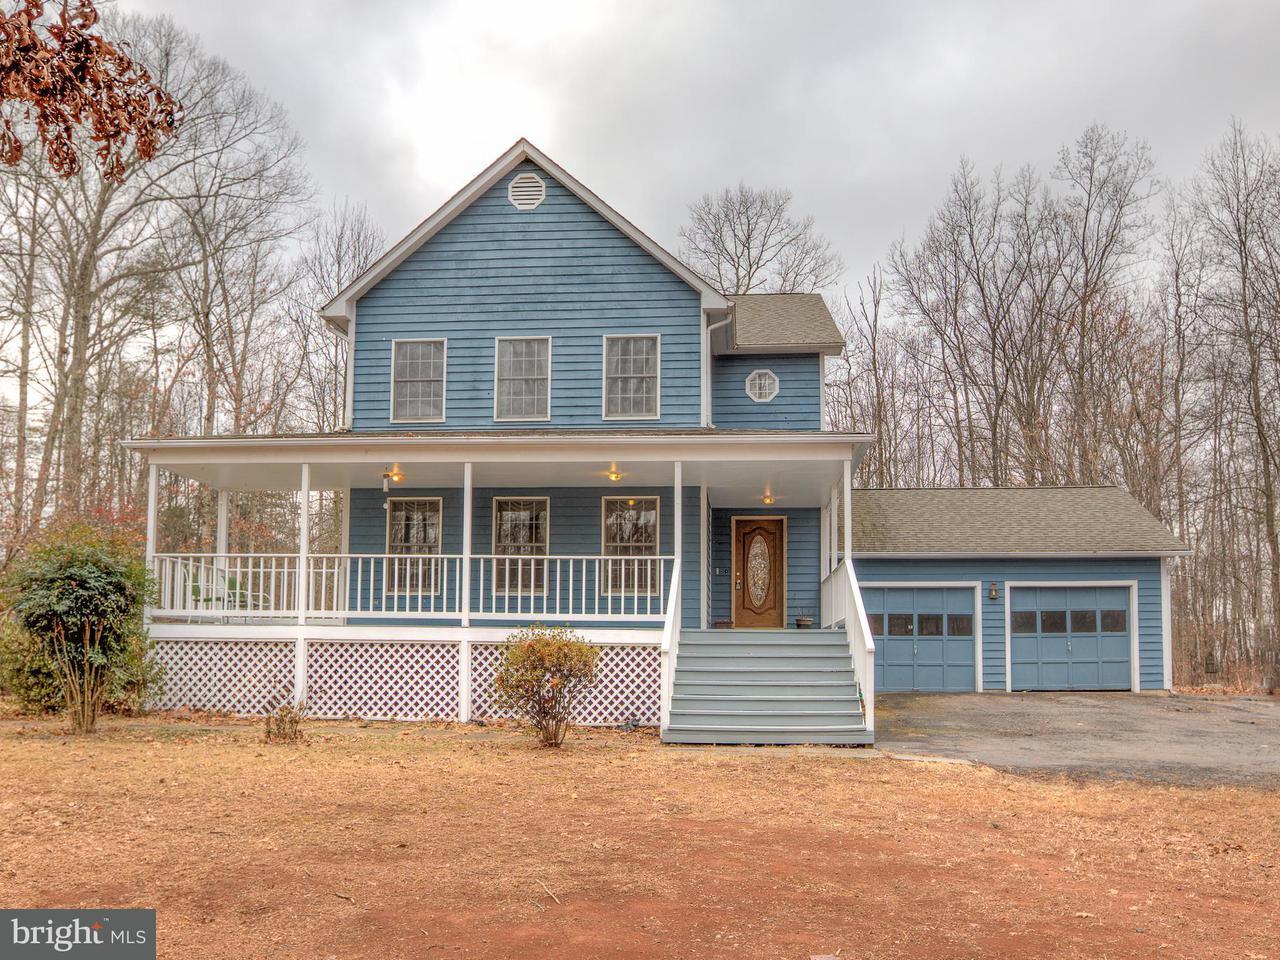 獨棟家庭住宅 為 出售 在 12121 RICHLAND Drive 12121 RICHLAND Drive Catharpin, 弗吉尼亞州 20143 美國